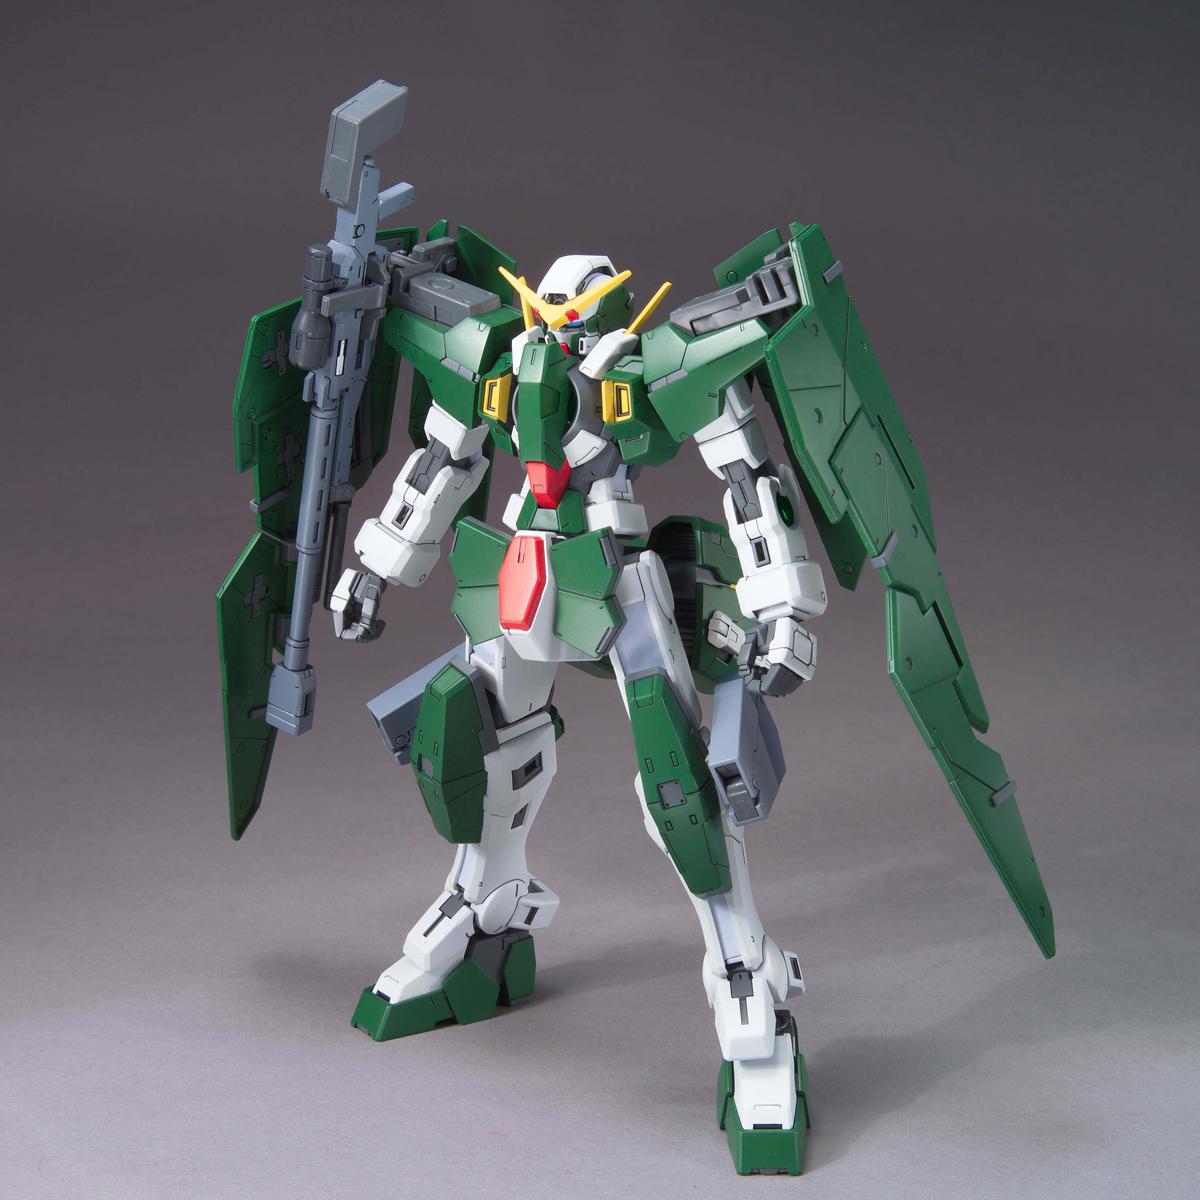 1/100 GN-002 ガンダムデュナメス [Gundam Dynames]